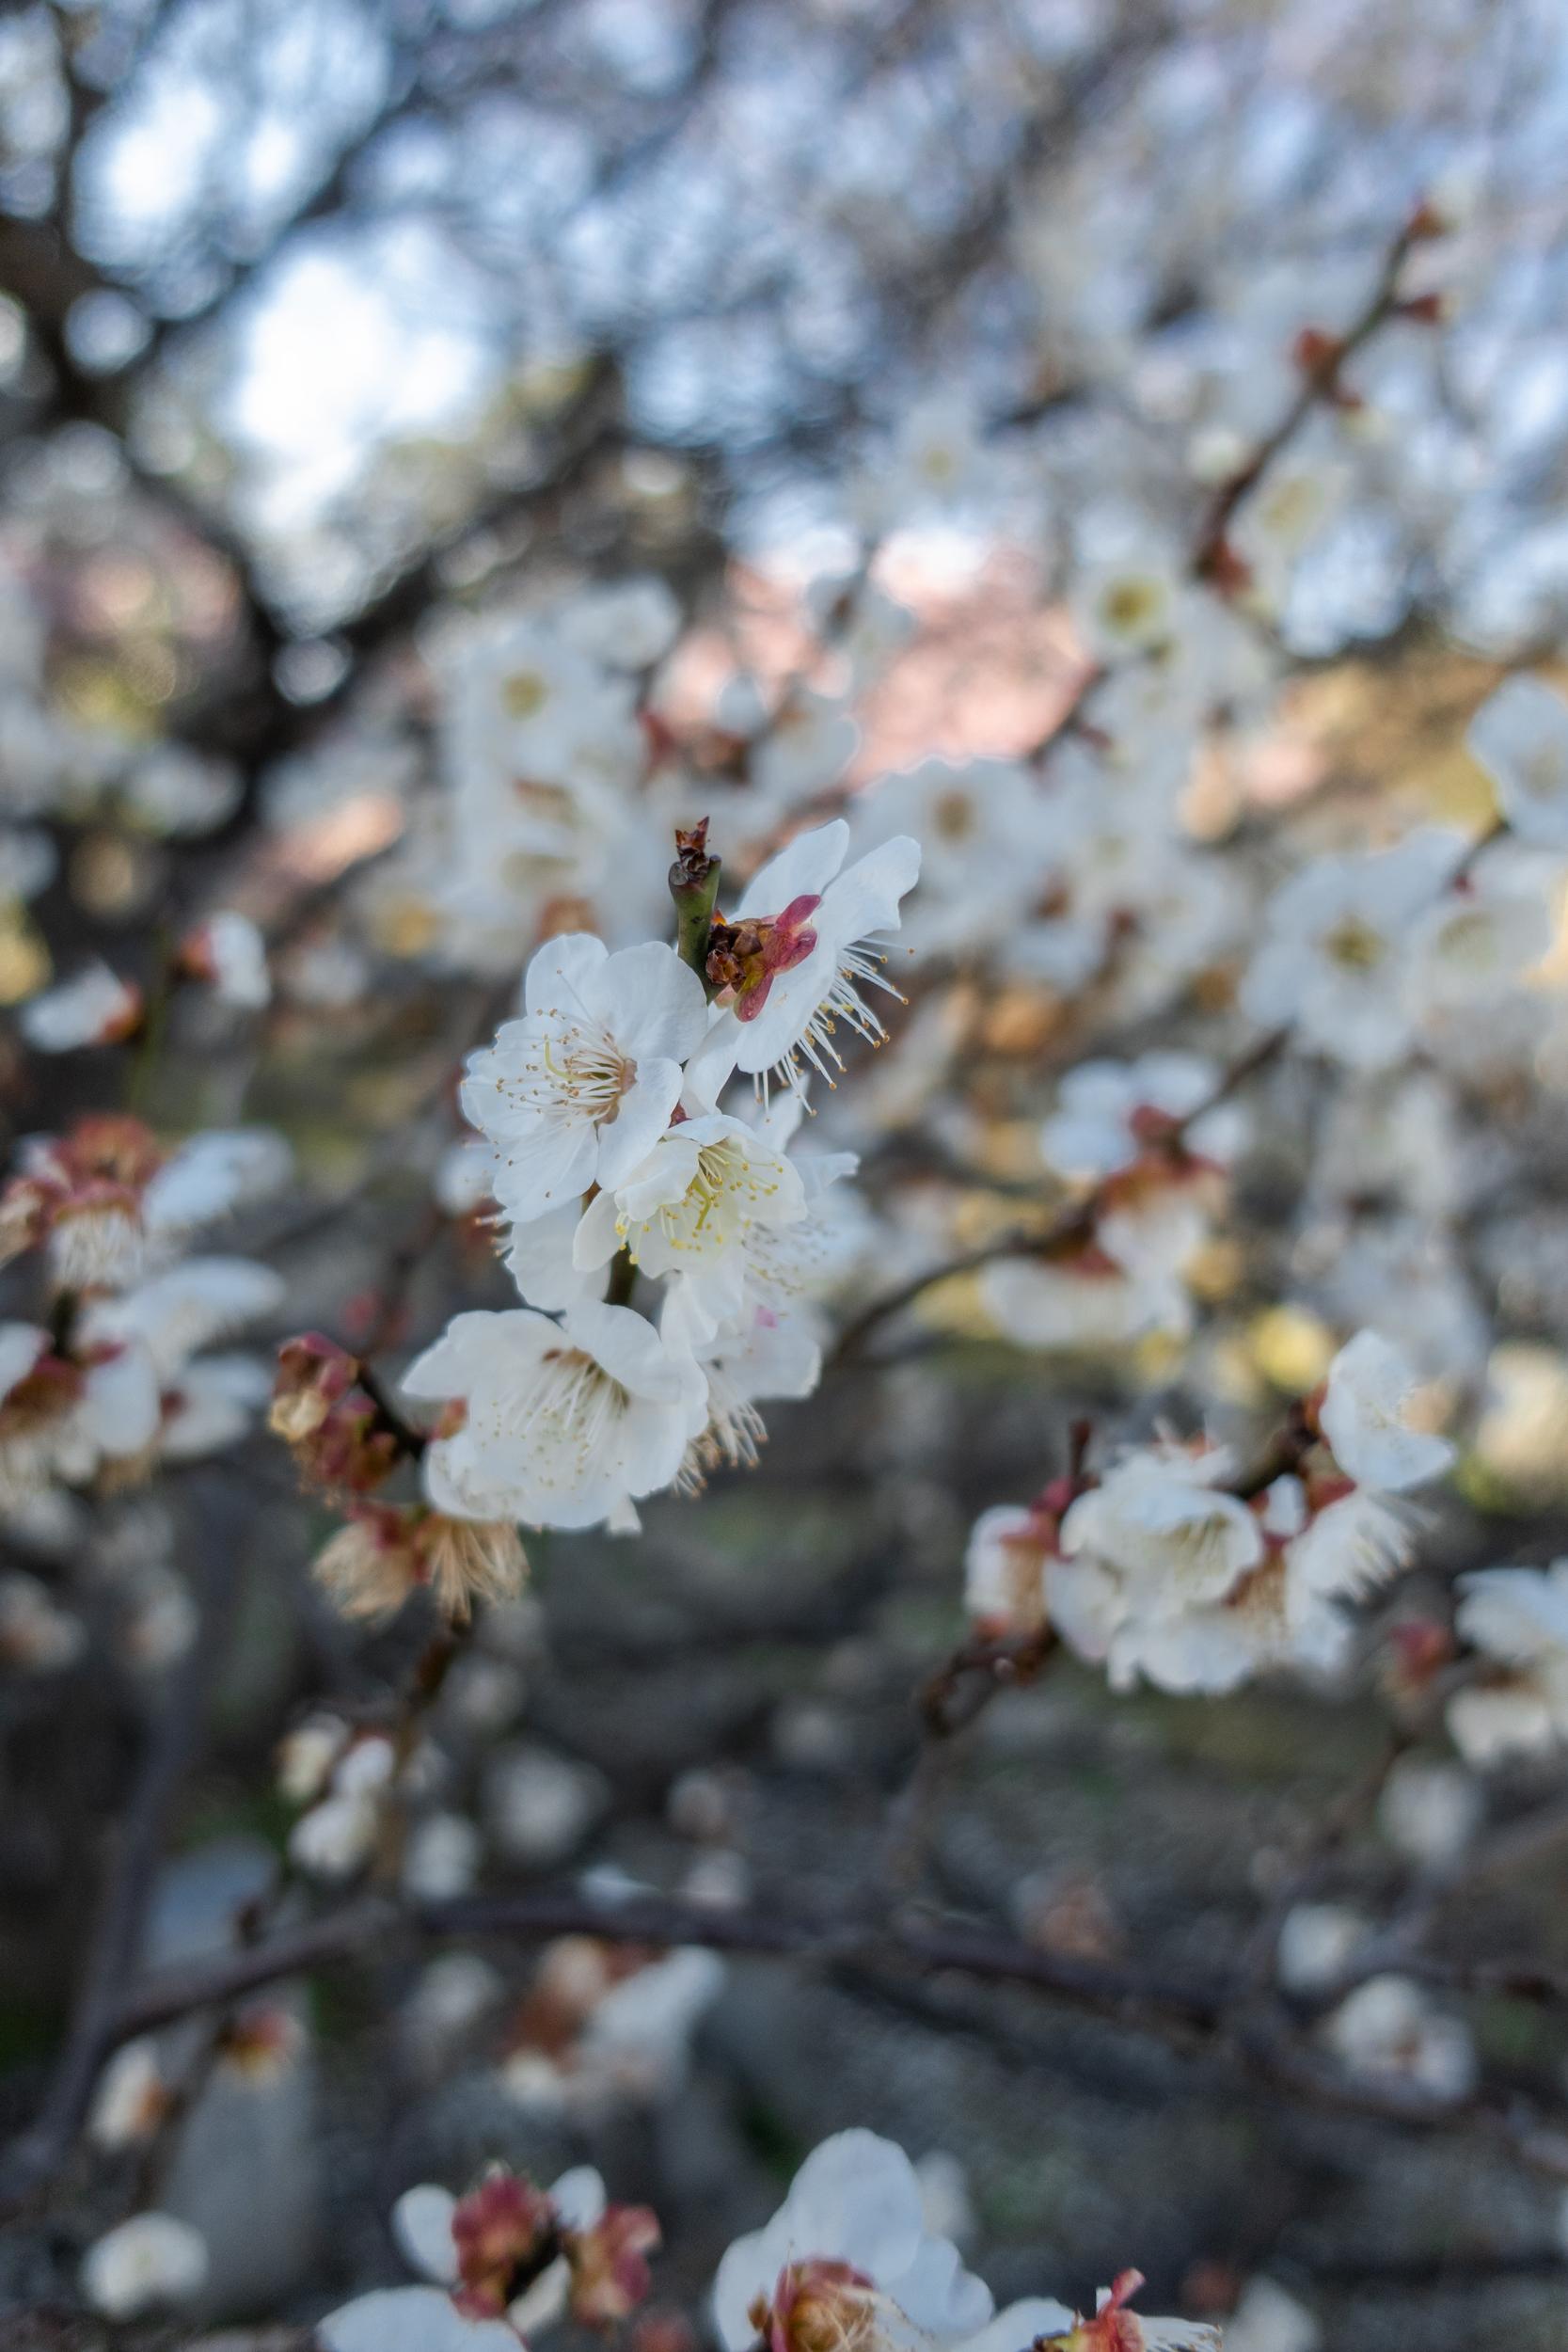 DSC03263 京都府 清凉寺(多宝塔と河津桜の美しい景色! 京都の春におすすめ桜写真スポット!撮影した写真の紹介、 アクセス方法や駐車場、桜の開花状況など)